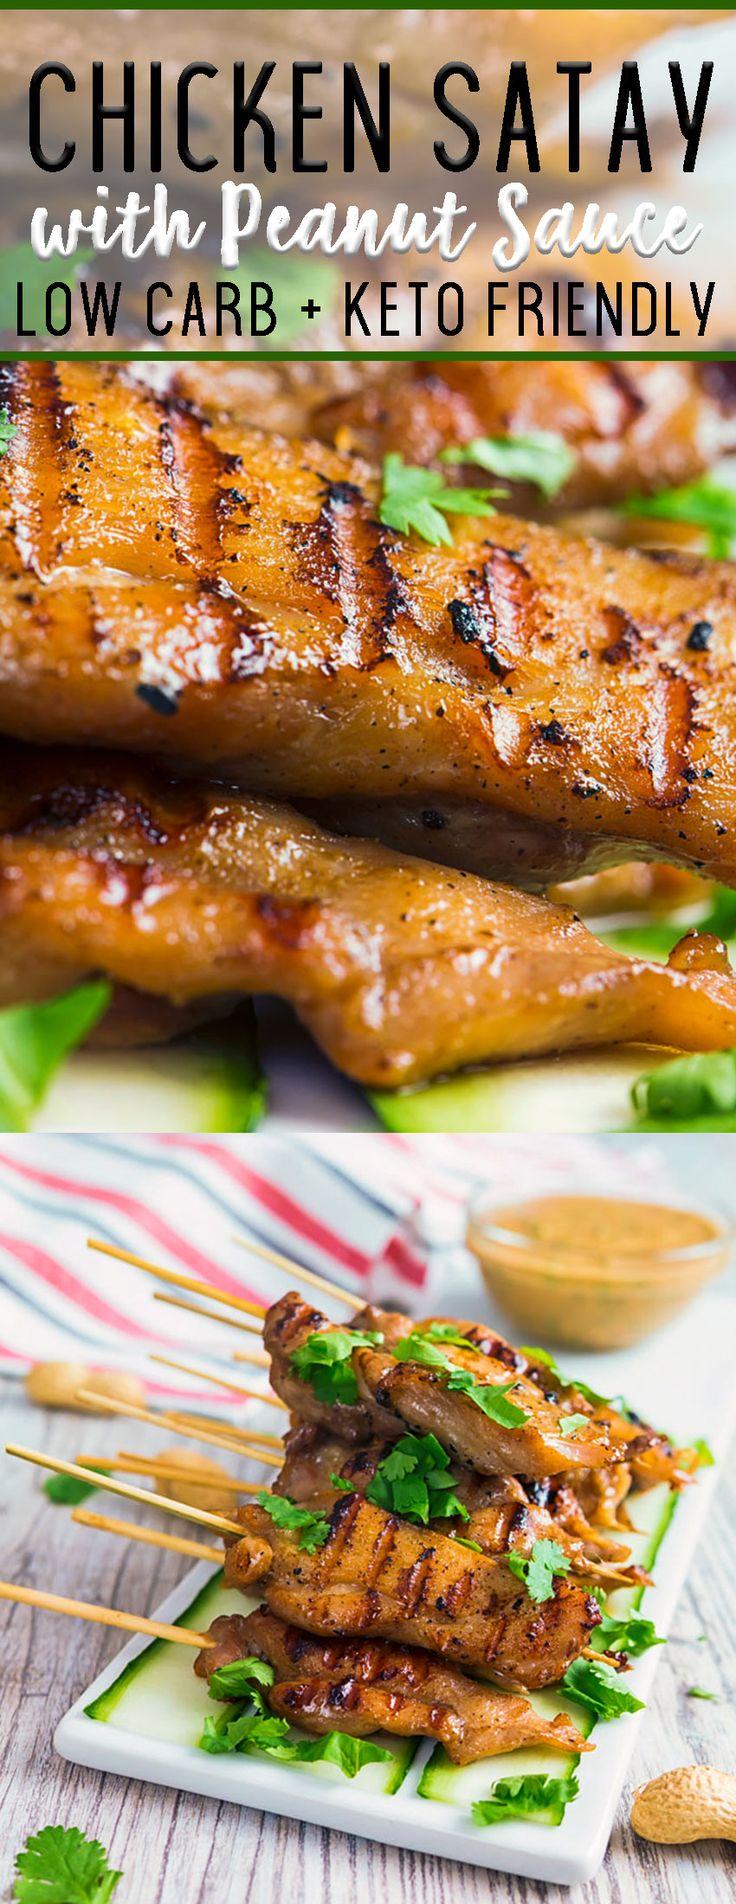 Keto Chicken Satay with Peanut Dipping Sauce